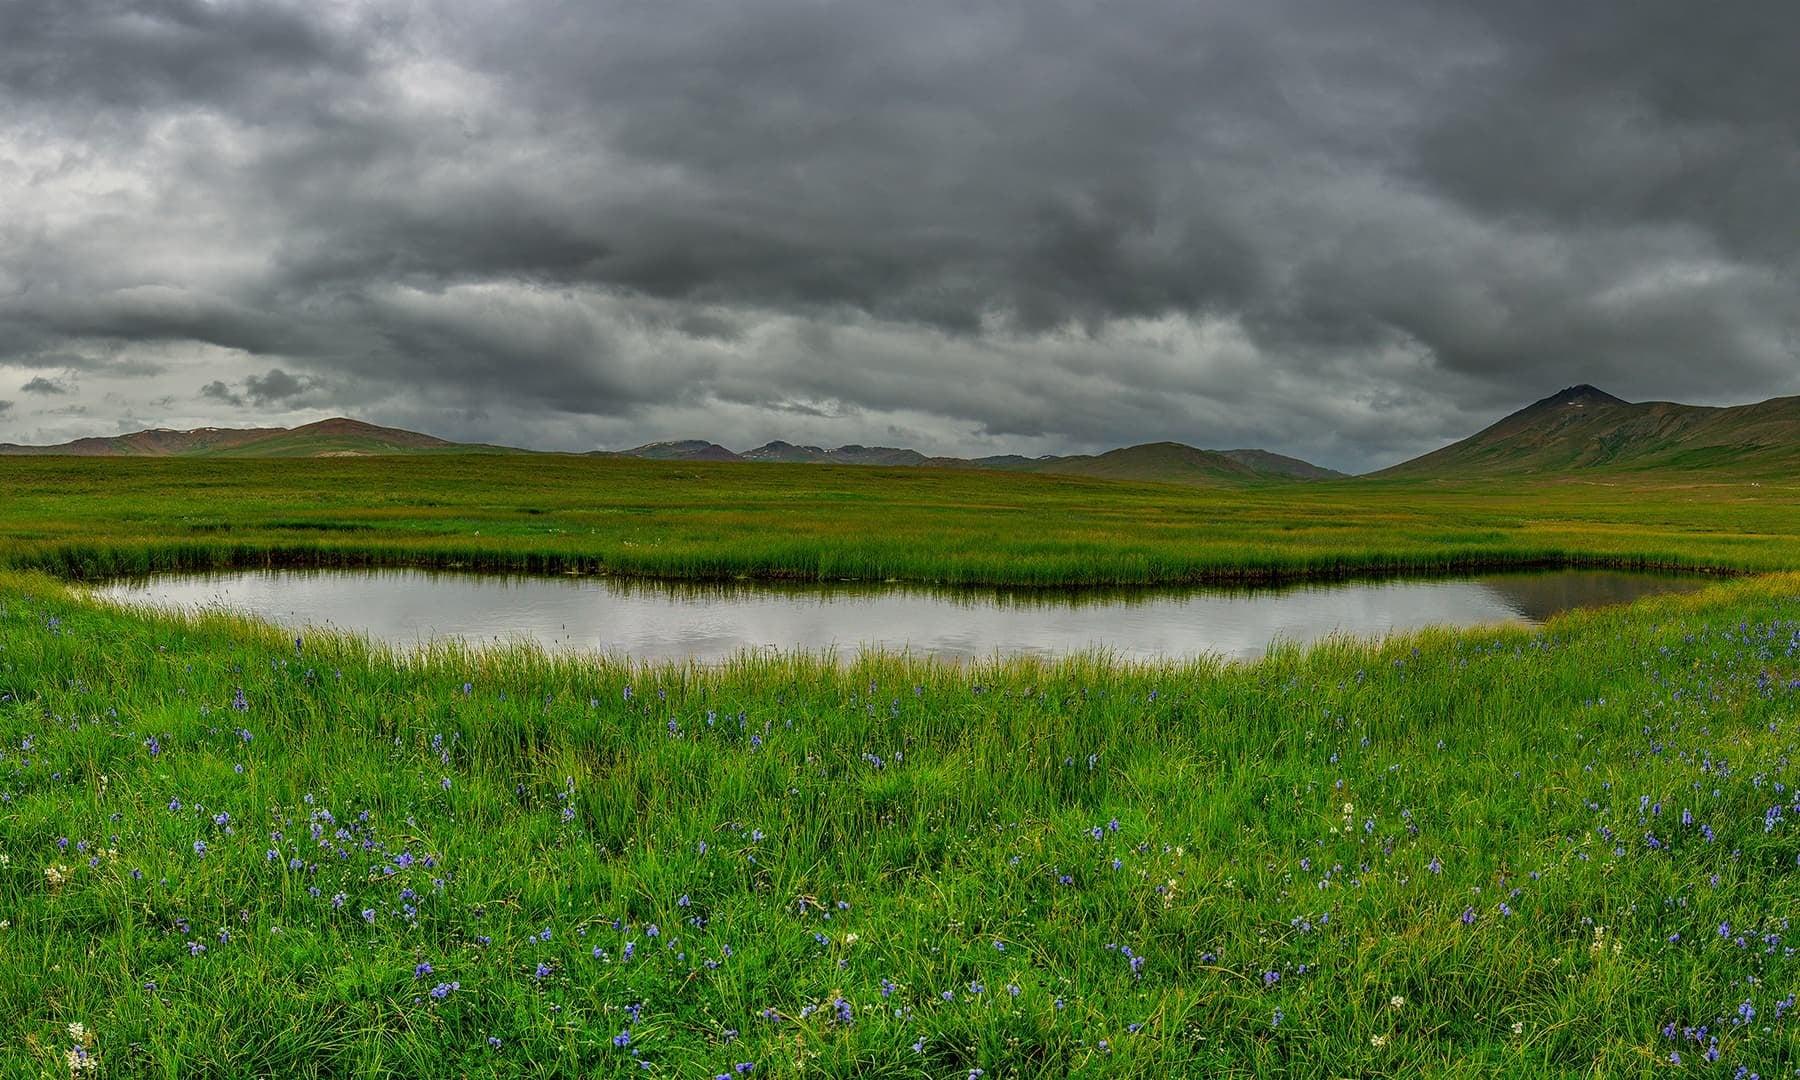 Deosai plains. — Photo by Syed Mehdi Bukhari